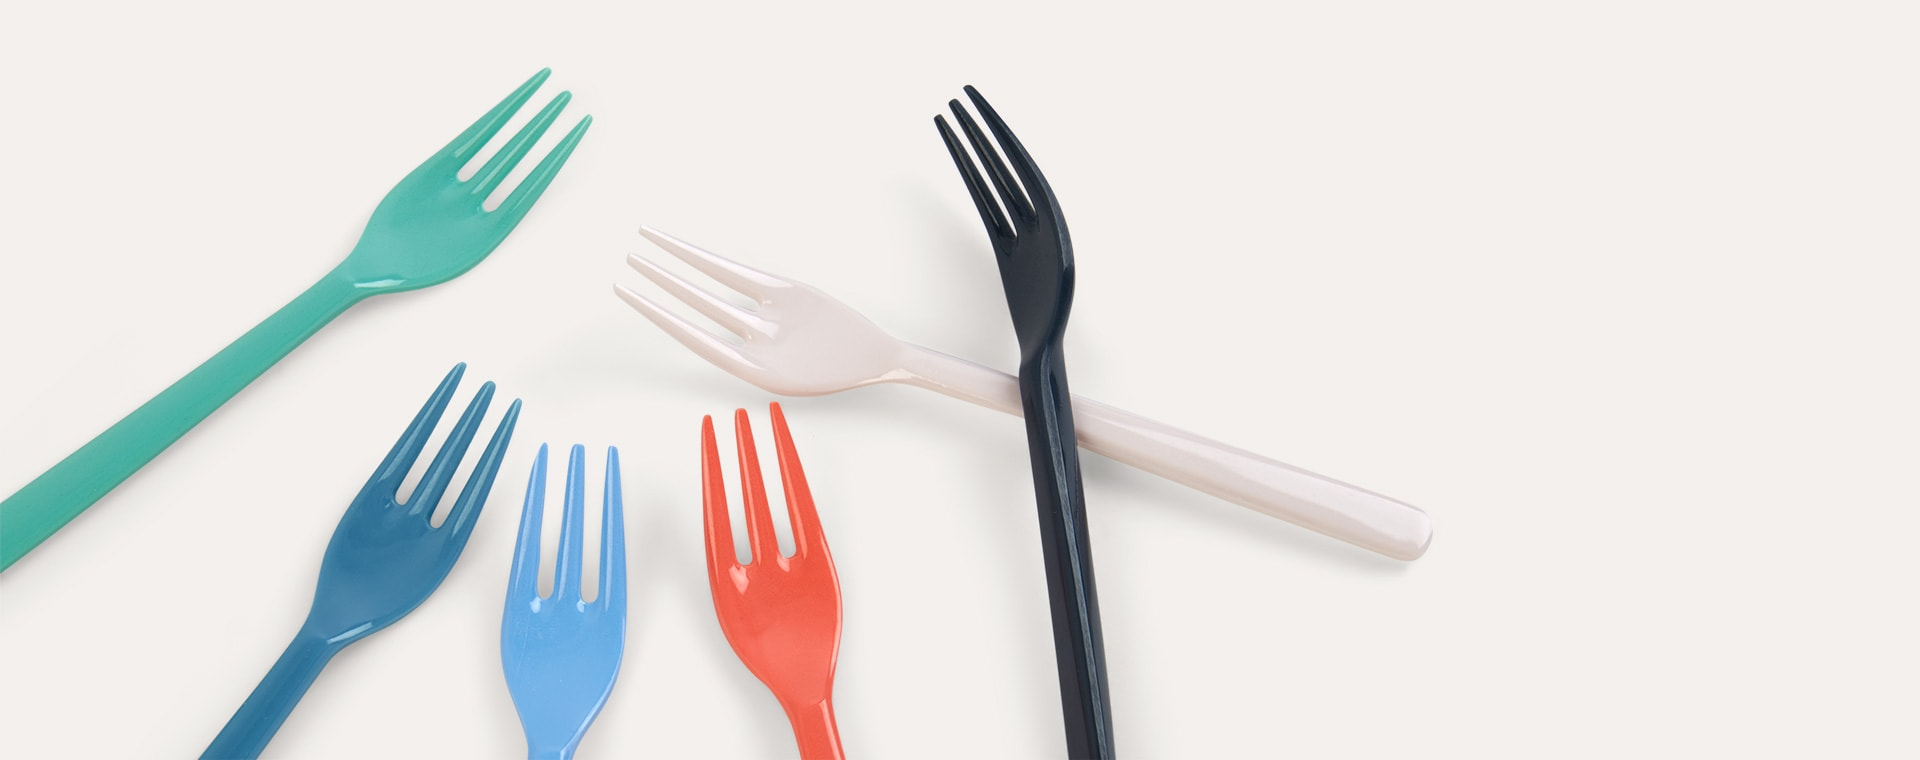 Forks Rice Melamine Cutlery 6 Pack